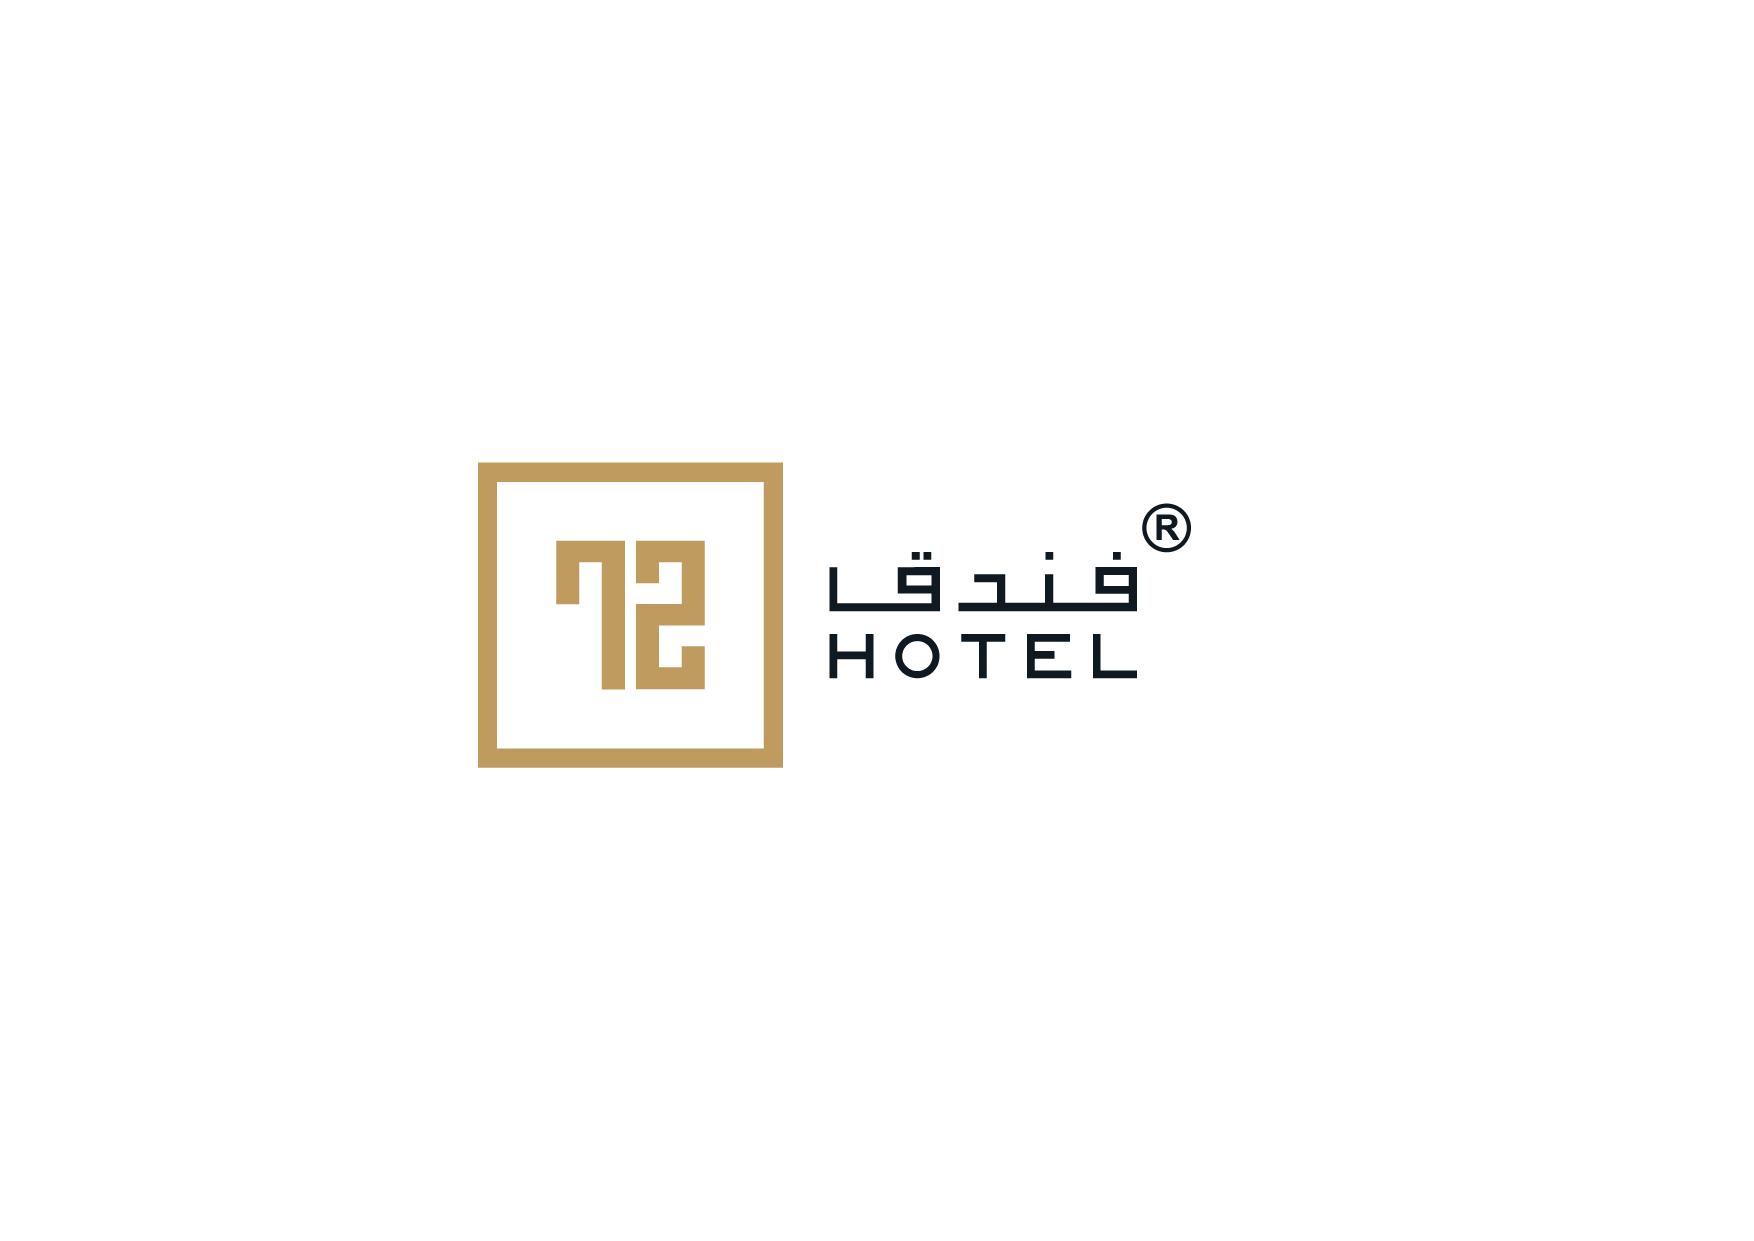 72 Hotel